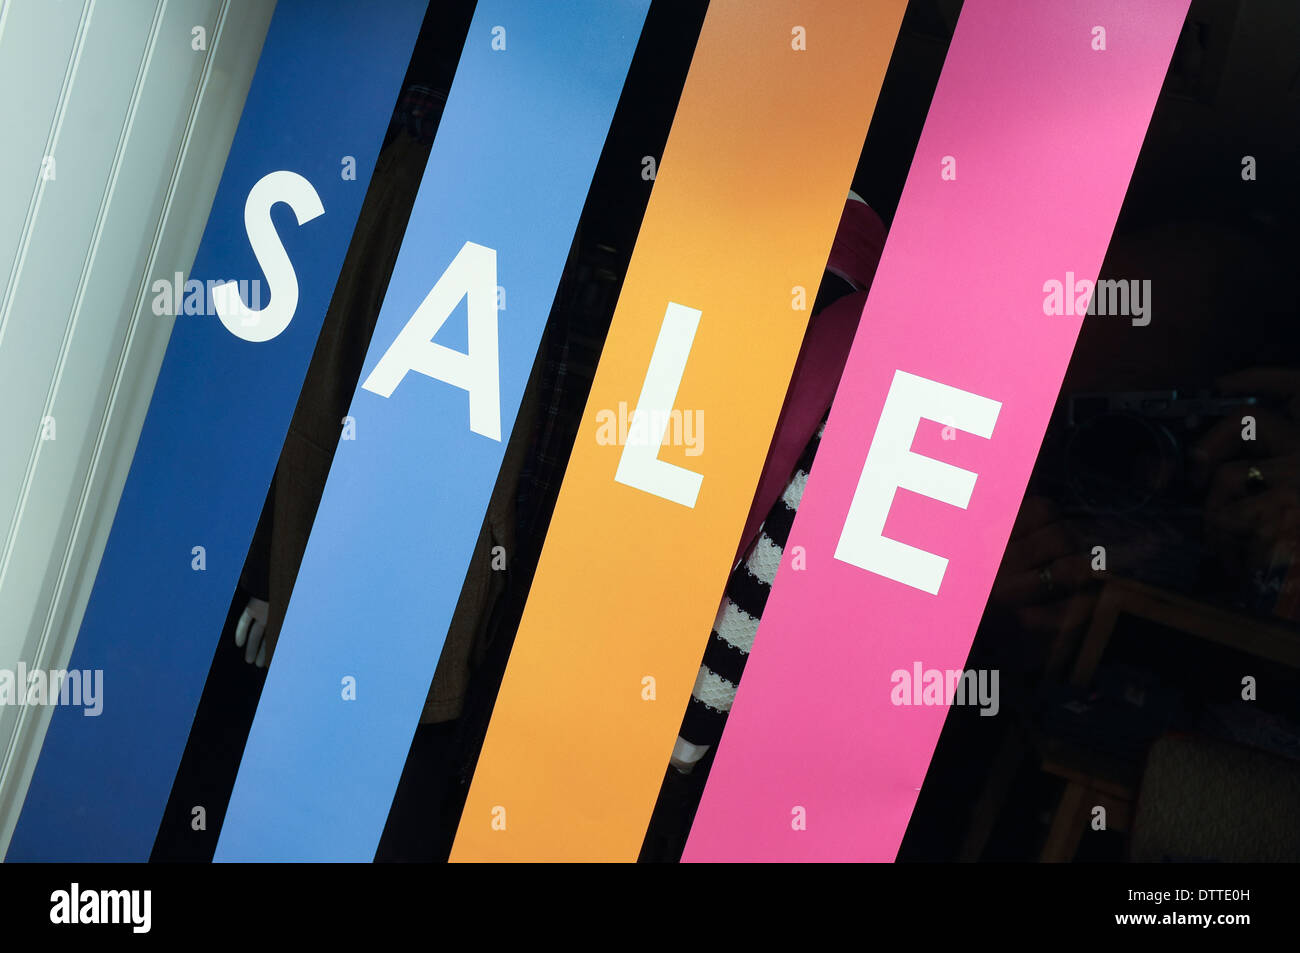 Shop window sale banners Crew store - Stock Image